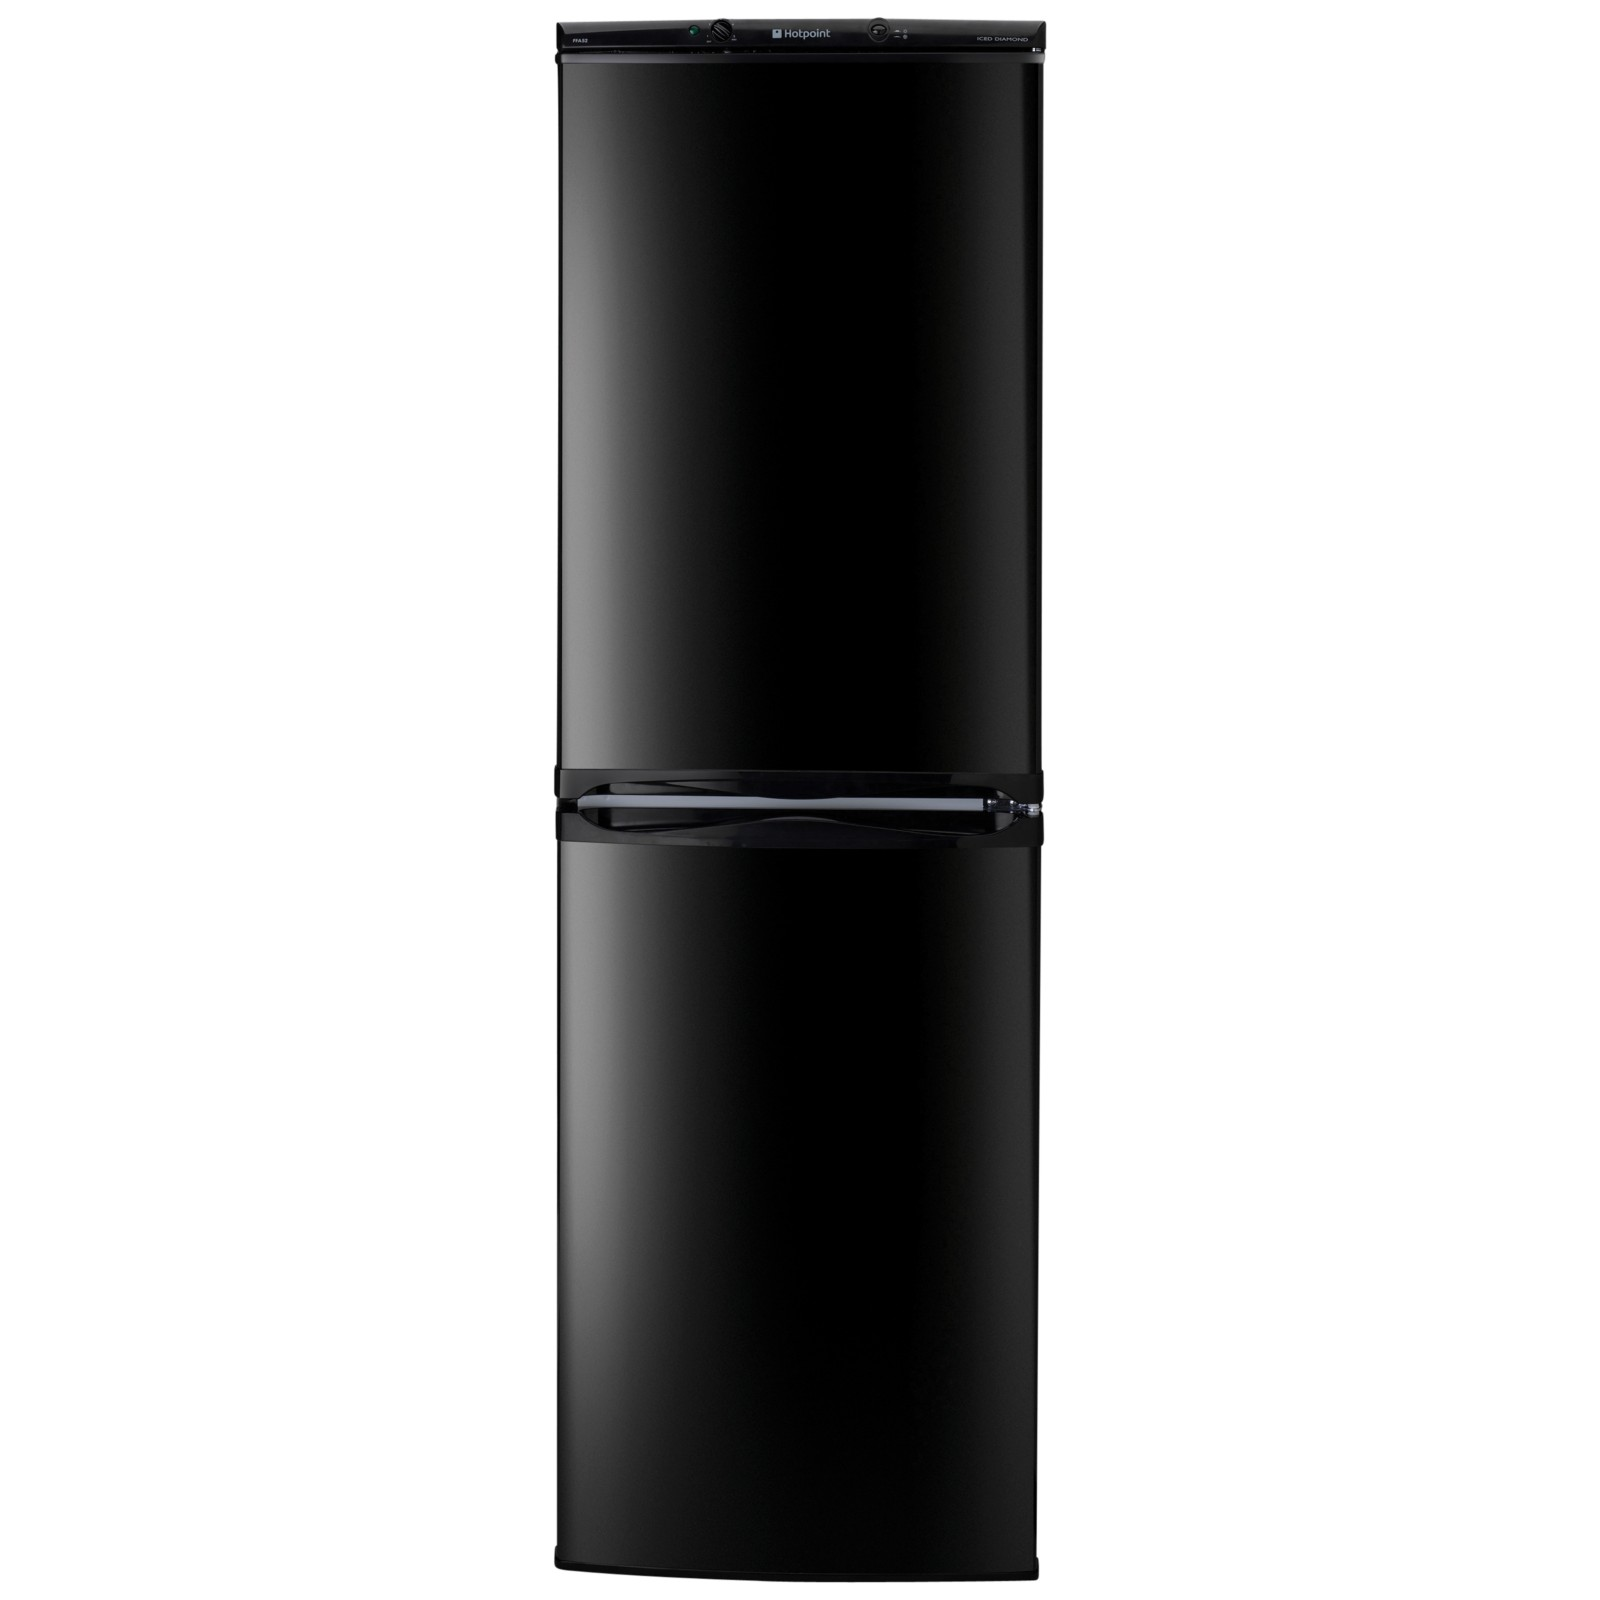 Hotpoint FFAA52K.1 Fridge Freezer